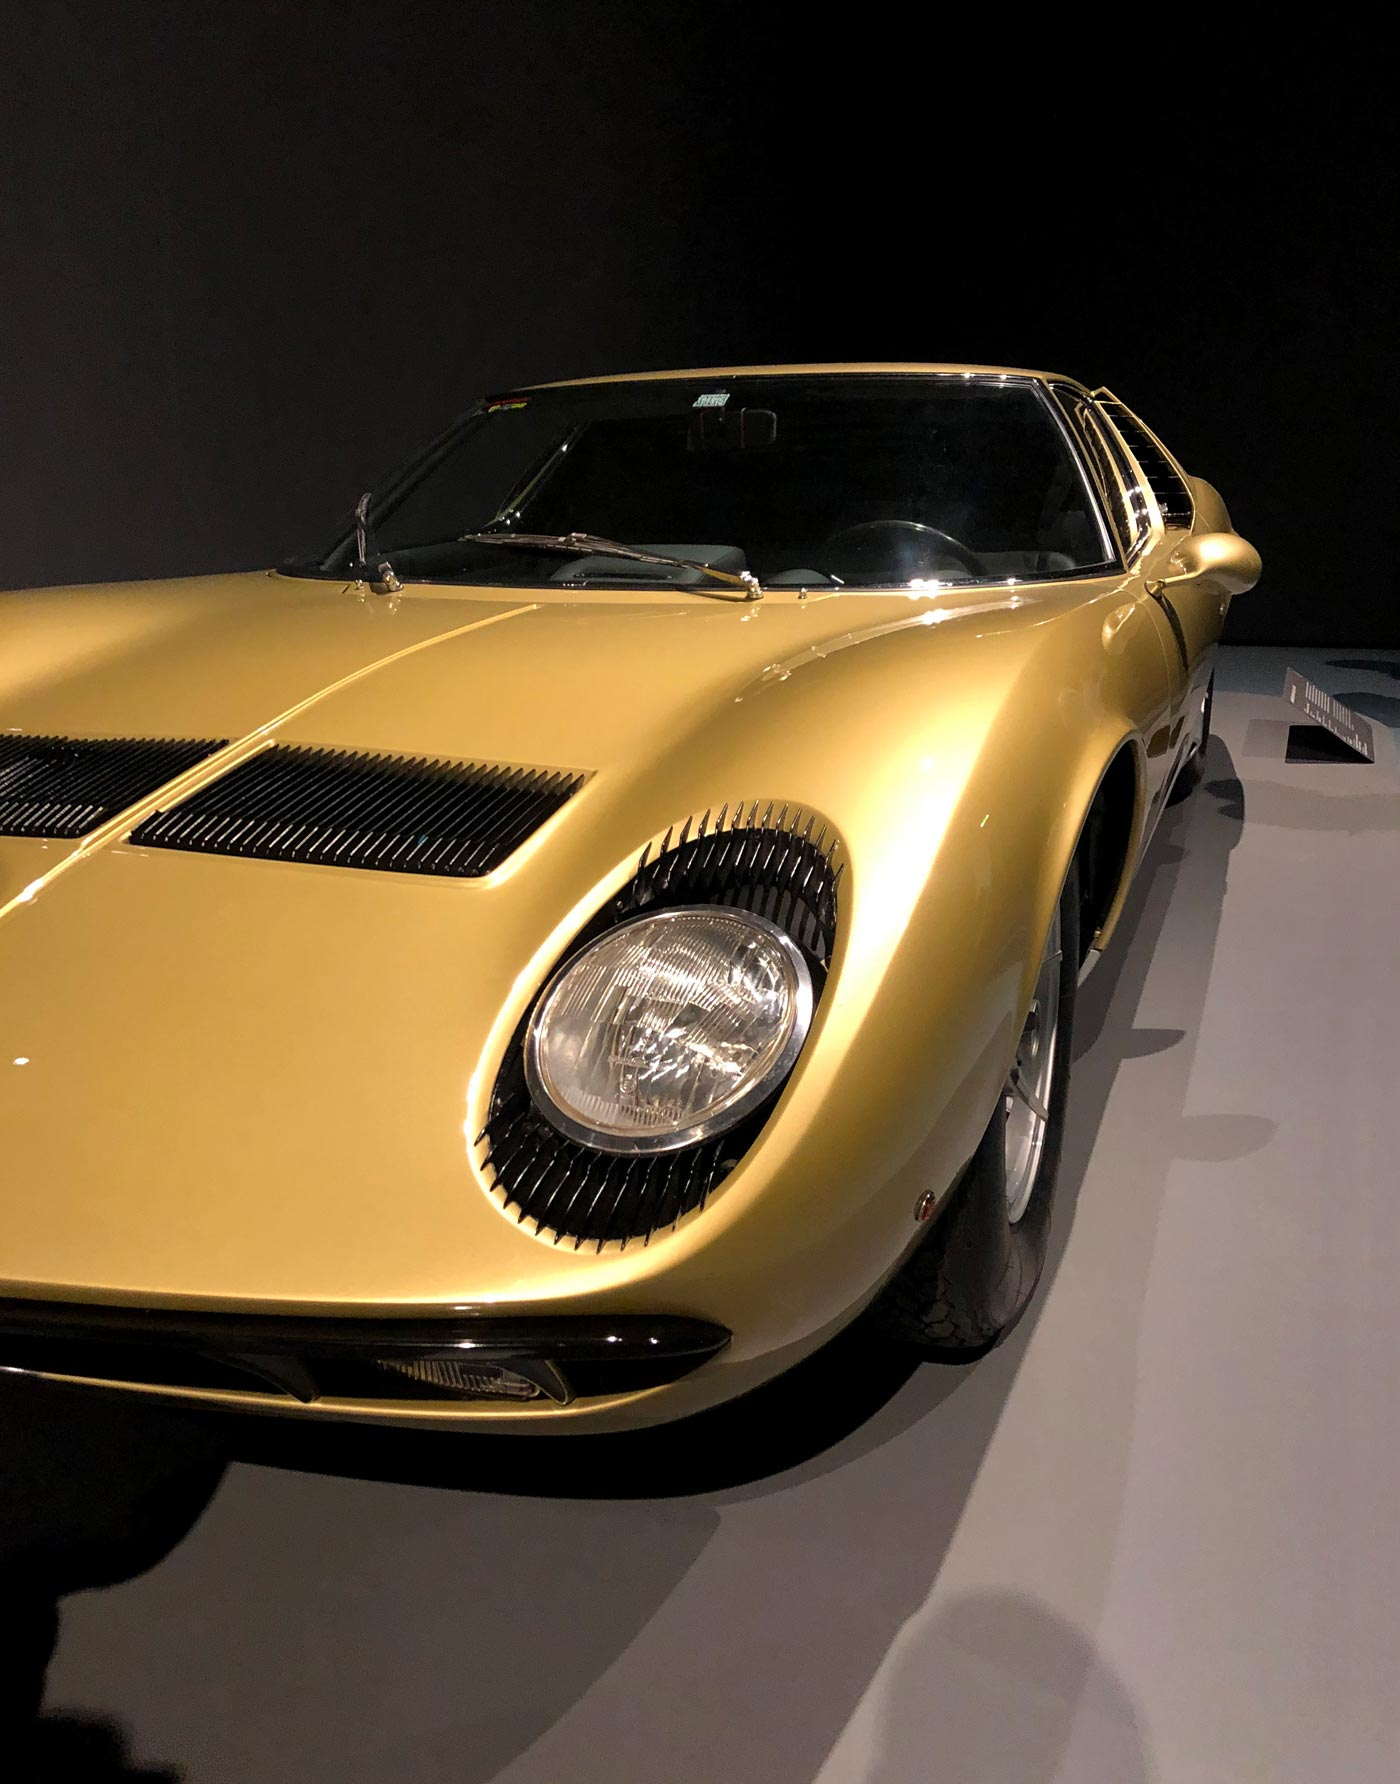 goldener Rennwagen